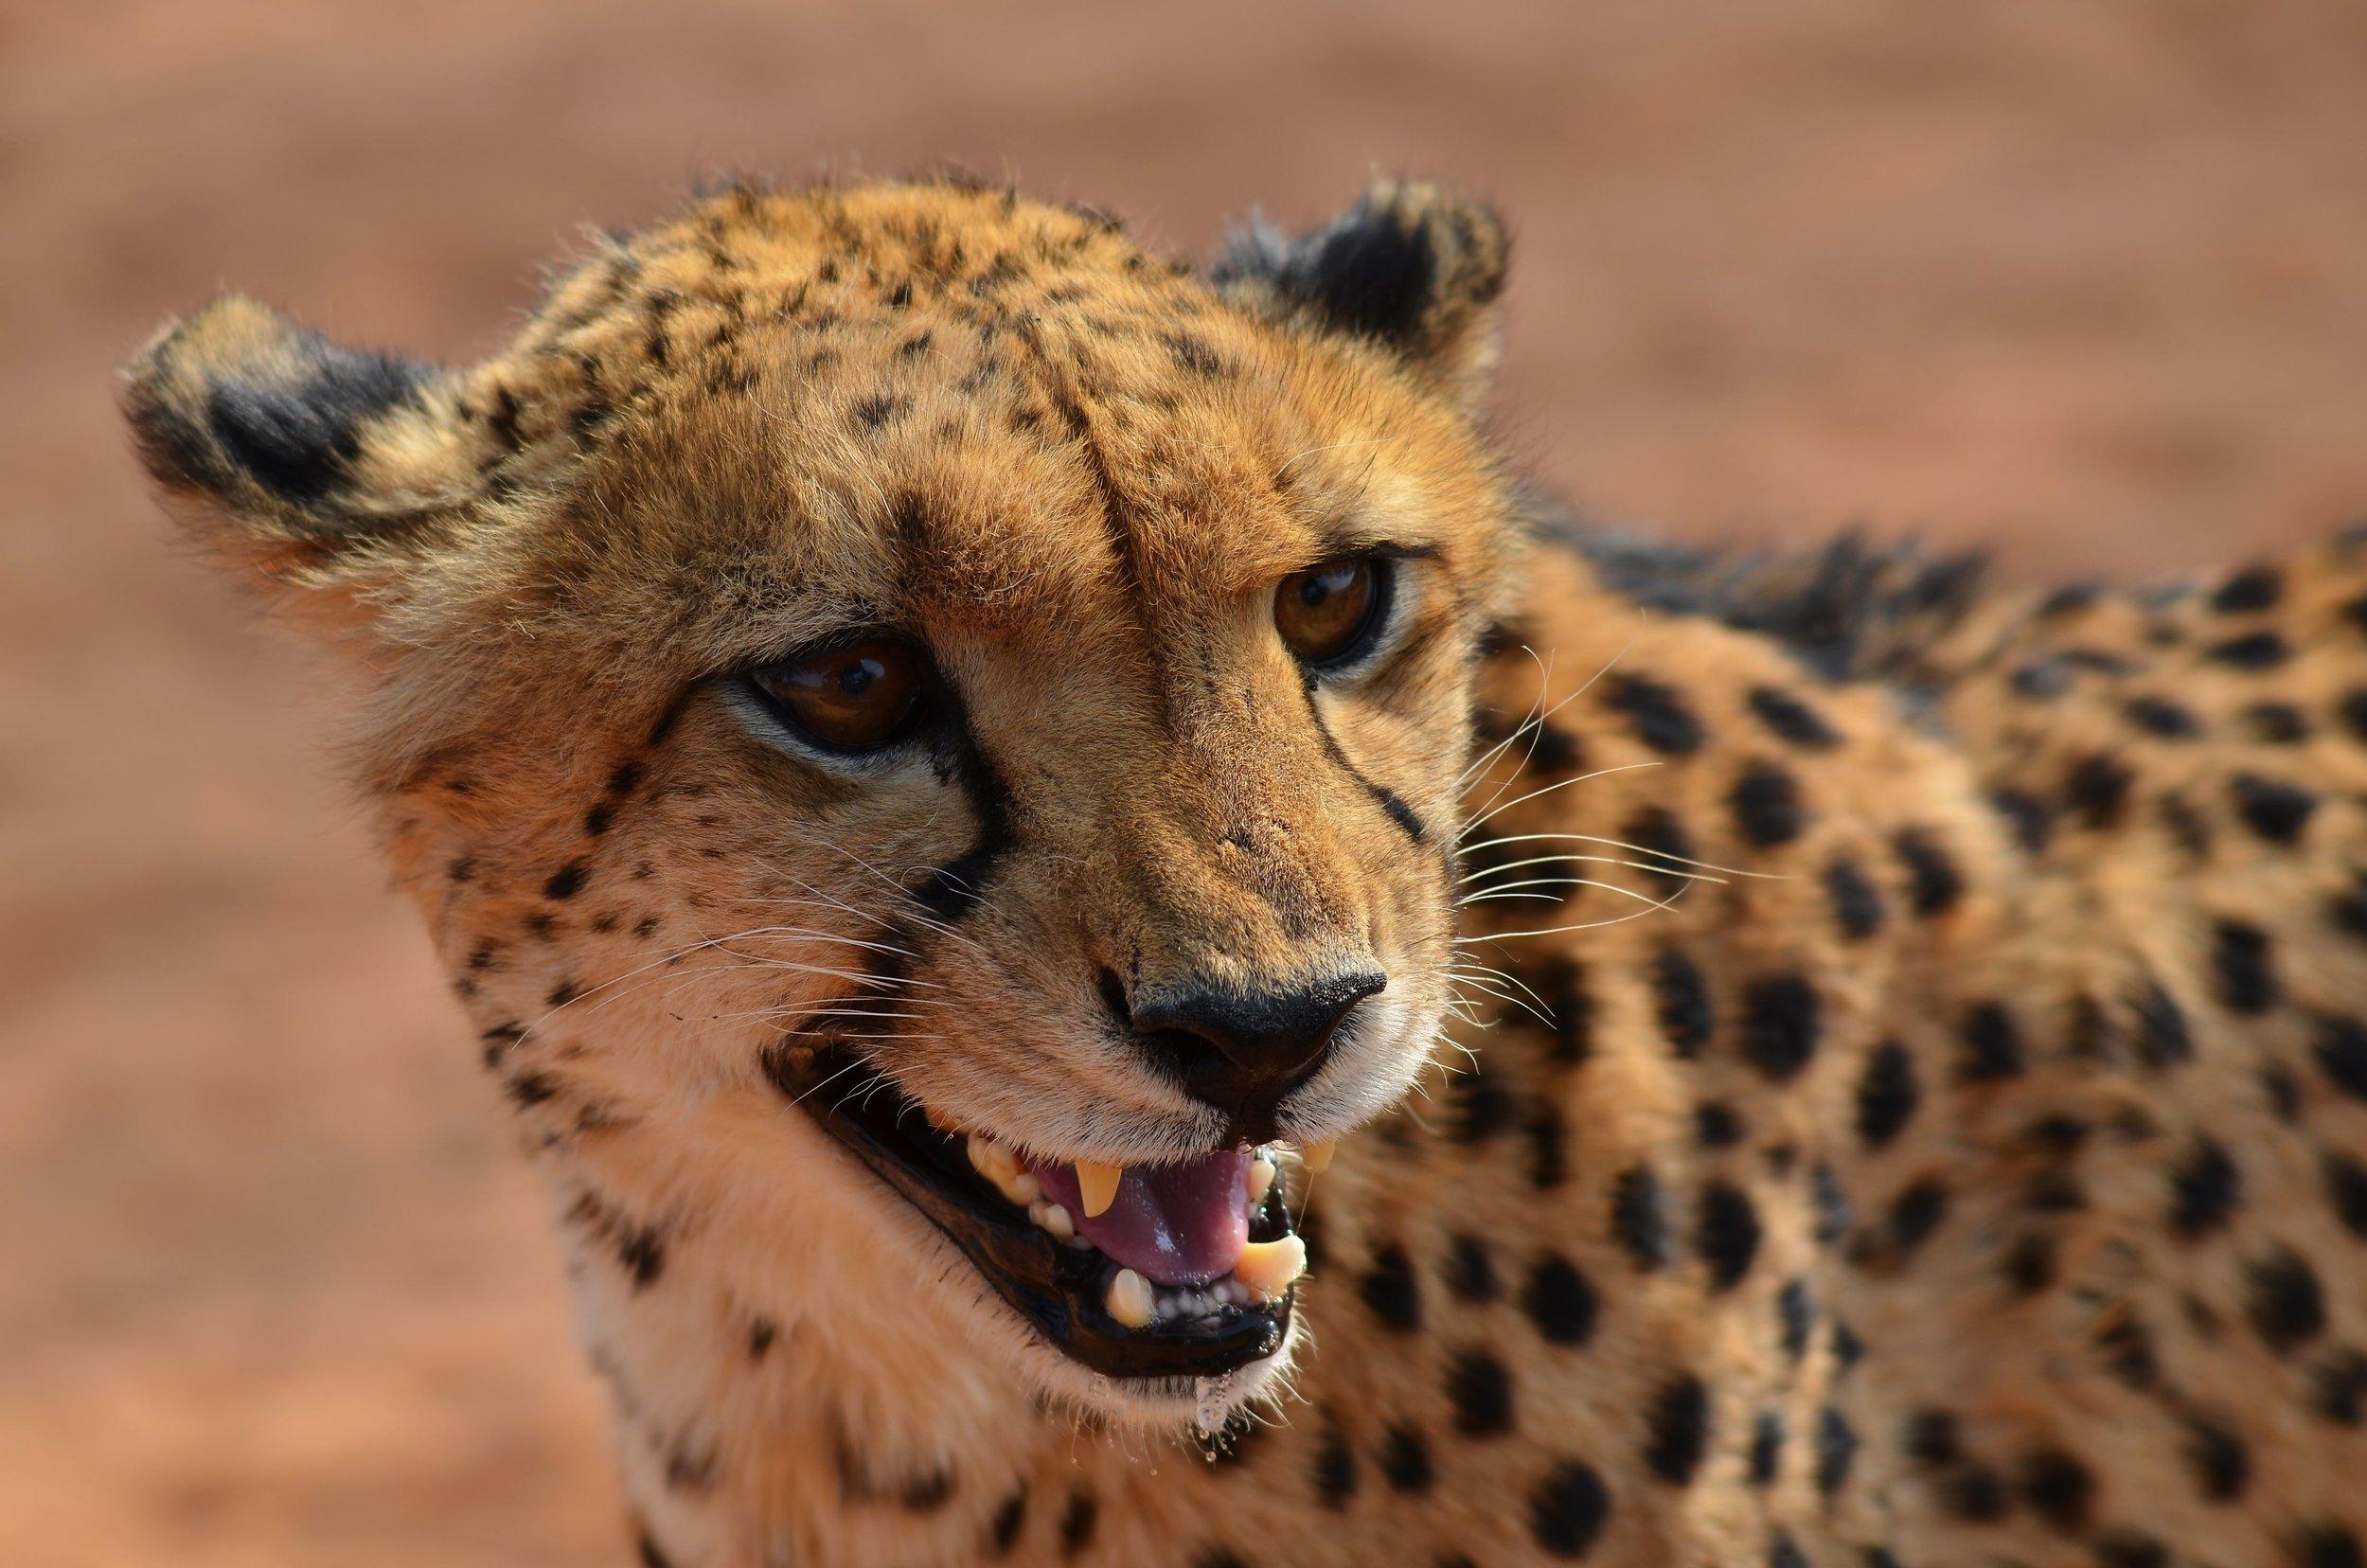 cheetah-2451779-min.jpg